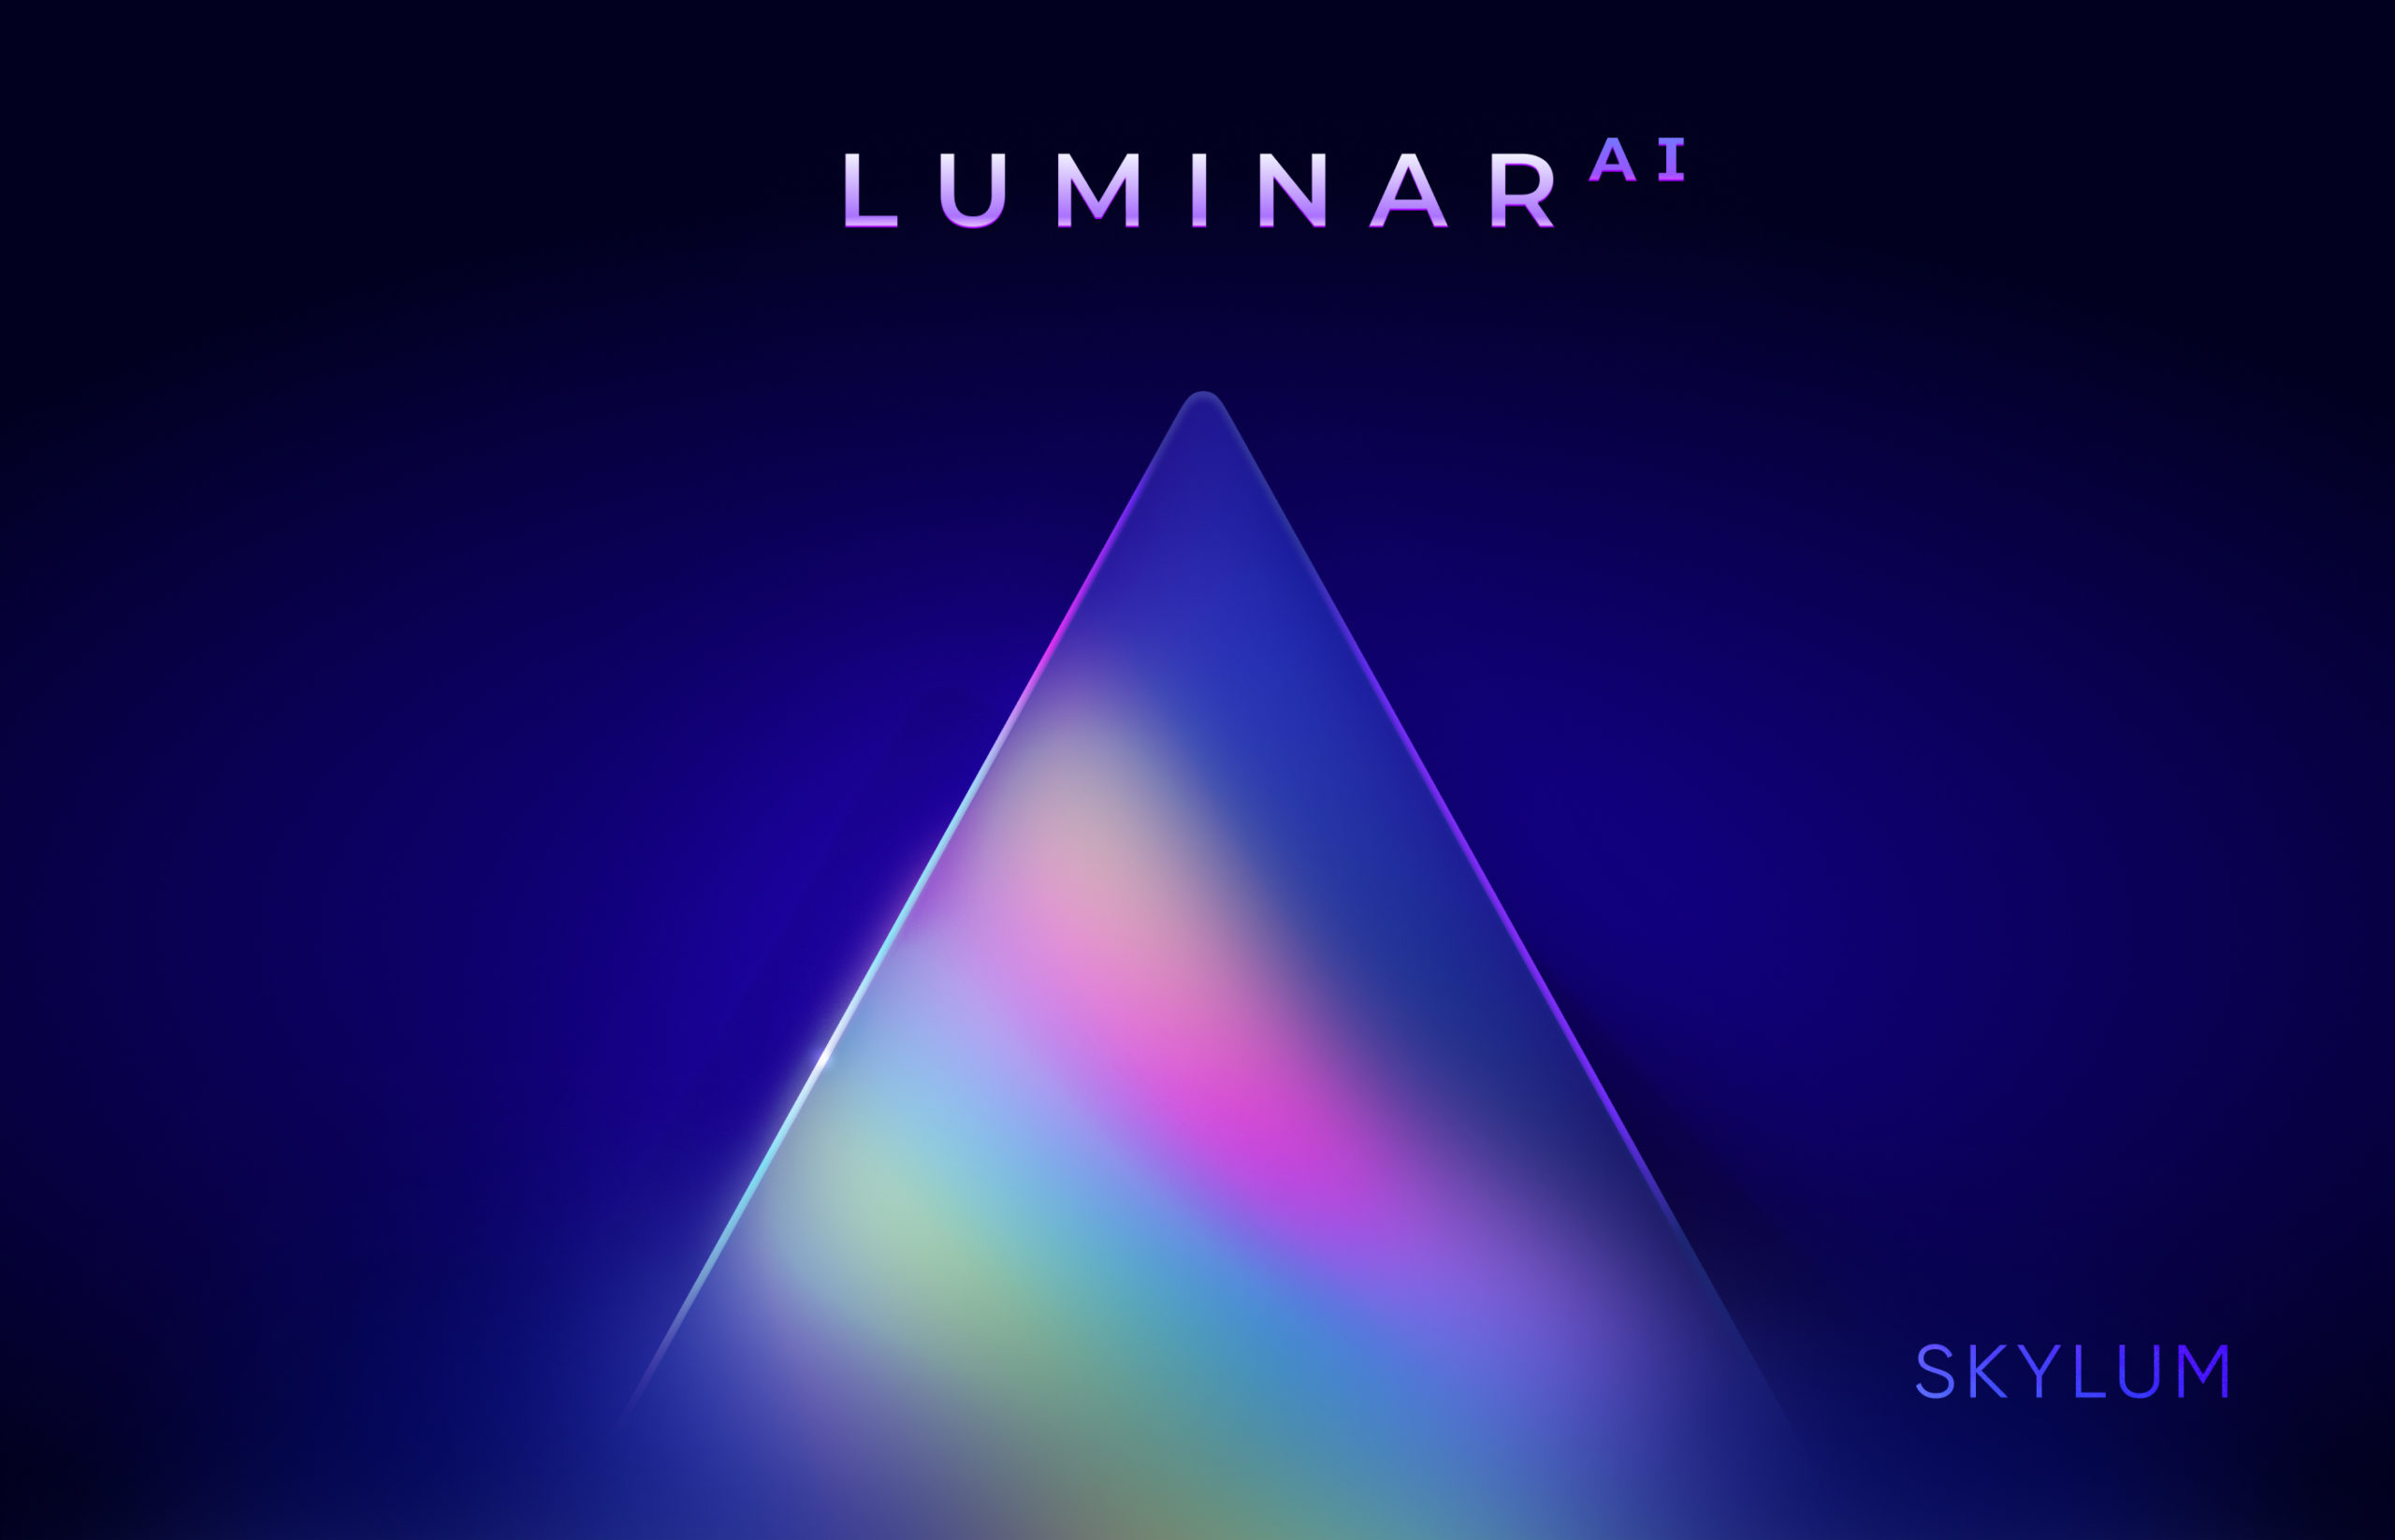 Luminar AI - Die neue Bildbearbeitung